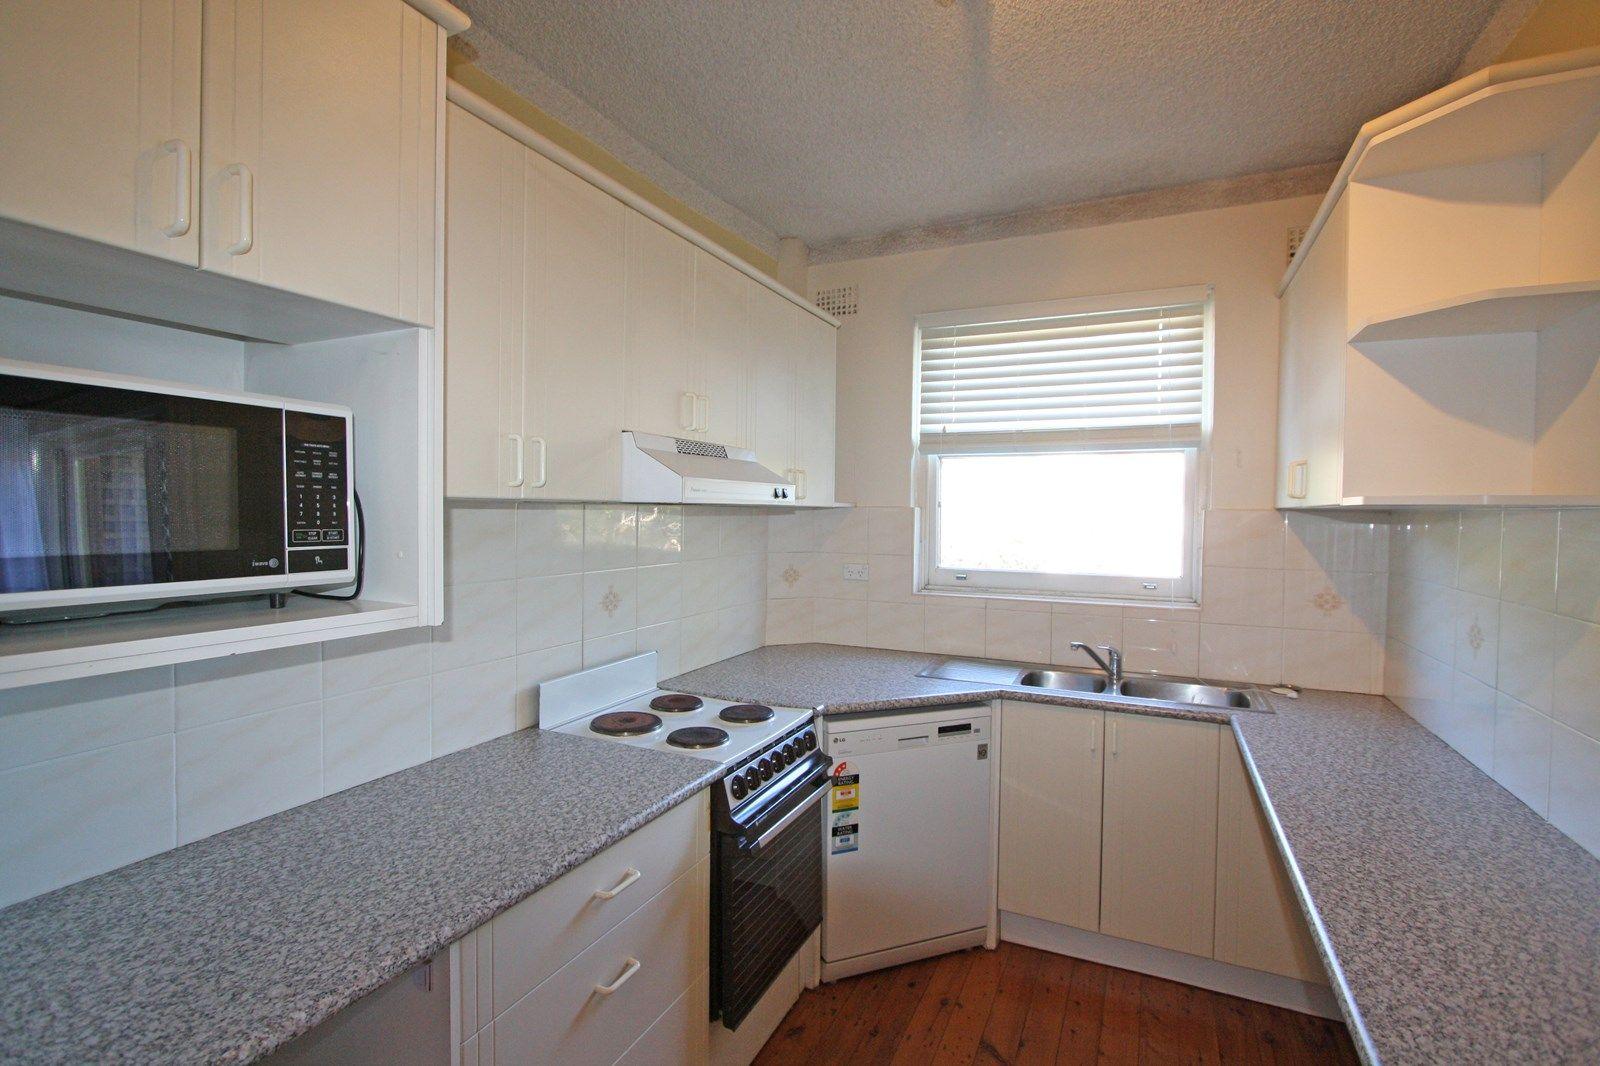 2/16-18 Koorala Street, Manly Vale NSW 2093, Image 1